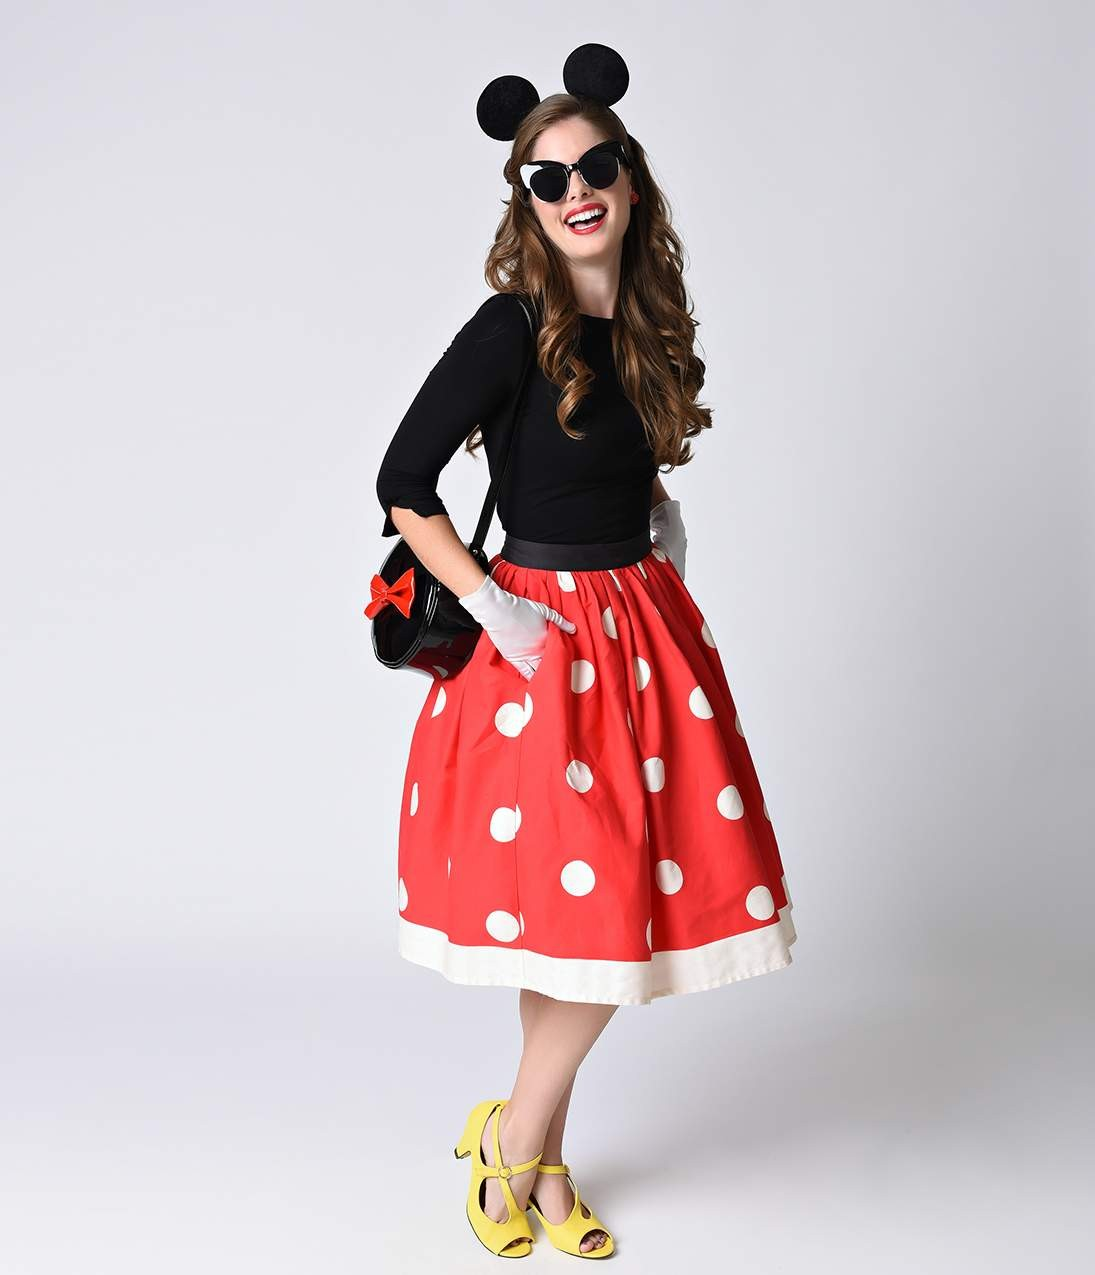 Unique_Vintage_1950s_Red_Ivory_Polka_Dot_High_Waist_Circle_Swing_Skirt_3.jpg